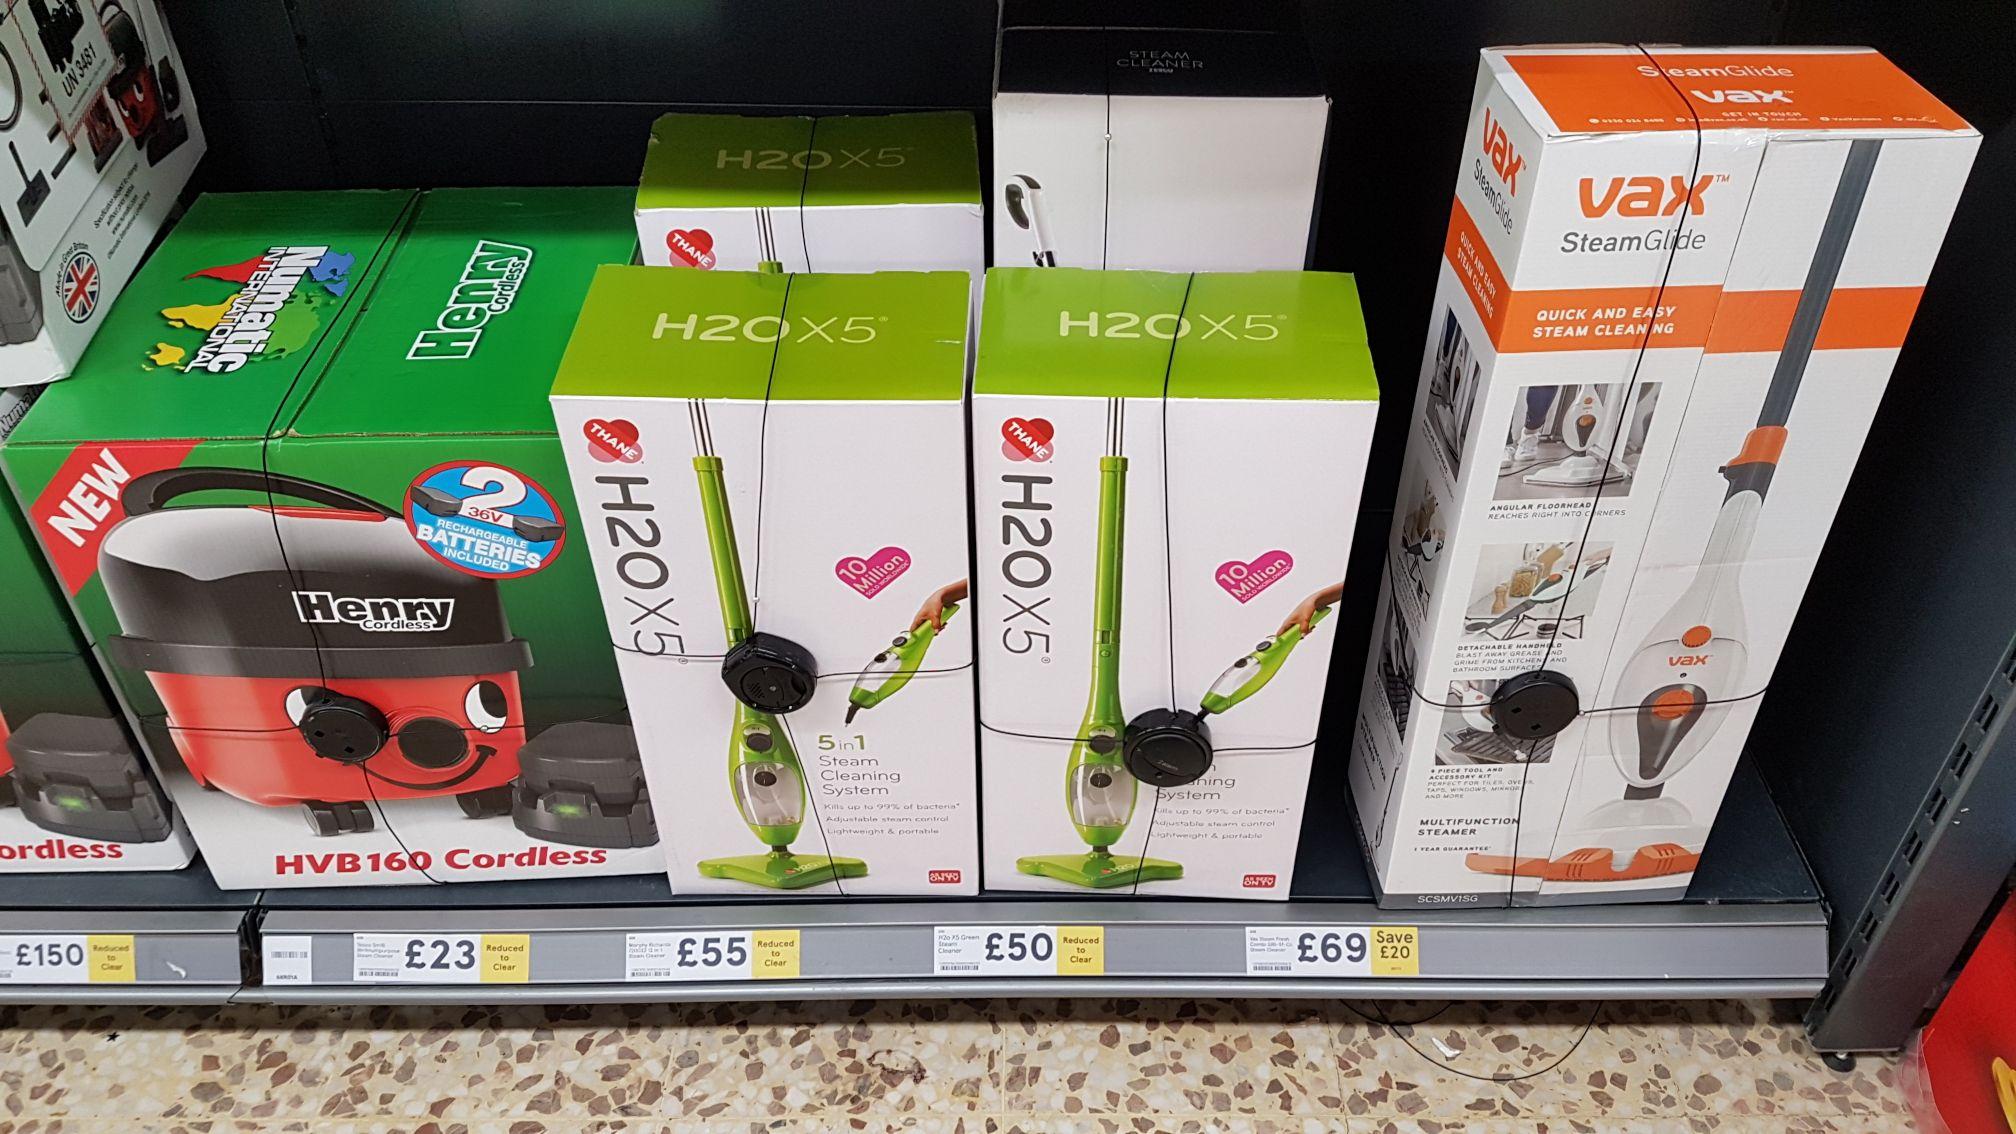 H2O X5 steam mop £50 in store at Milton Keynes Tesco